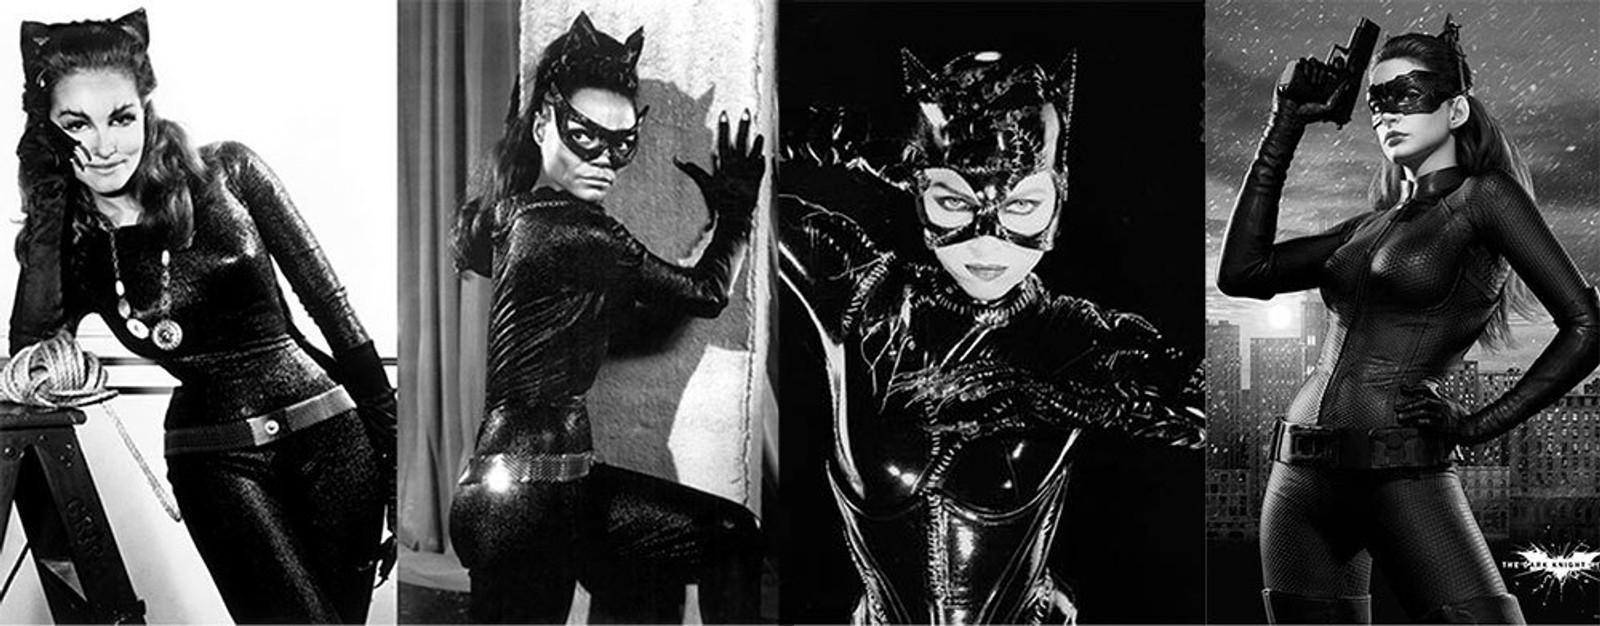 CatwomanCostumes